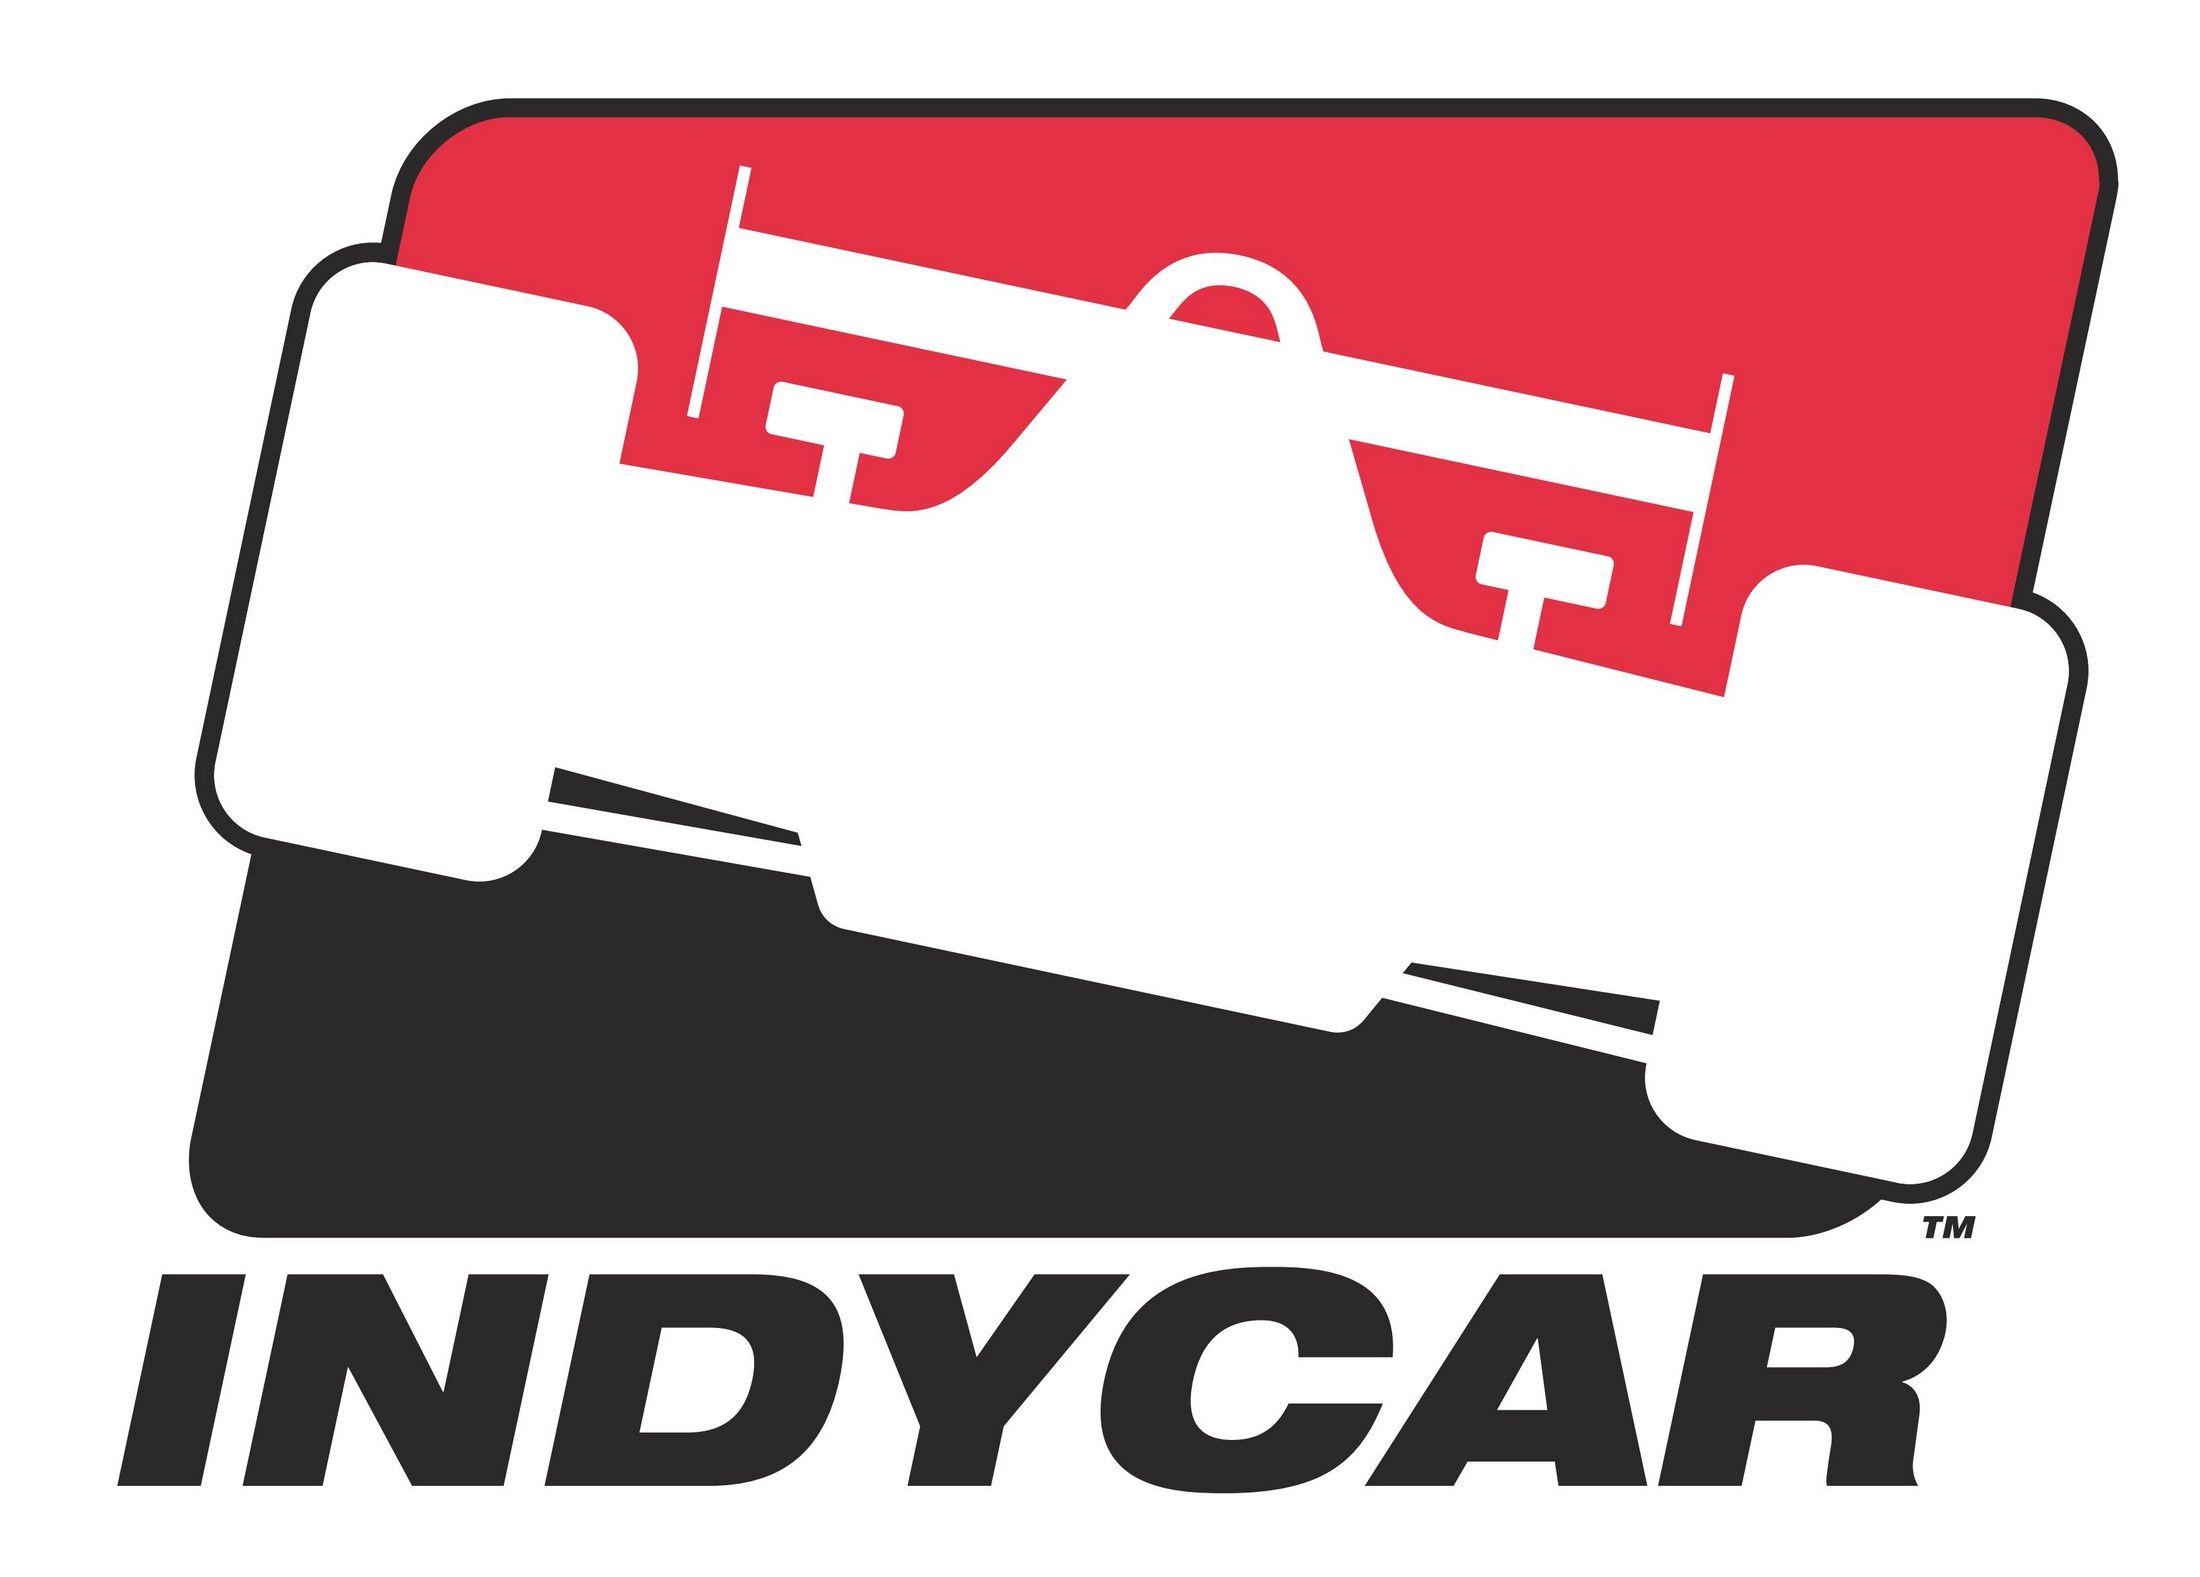 2200x1577 Indycar Logo [Eps File]